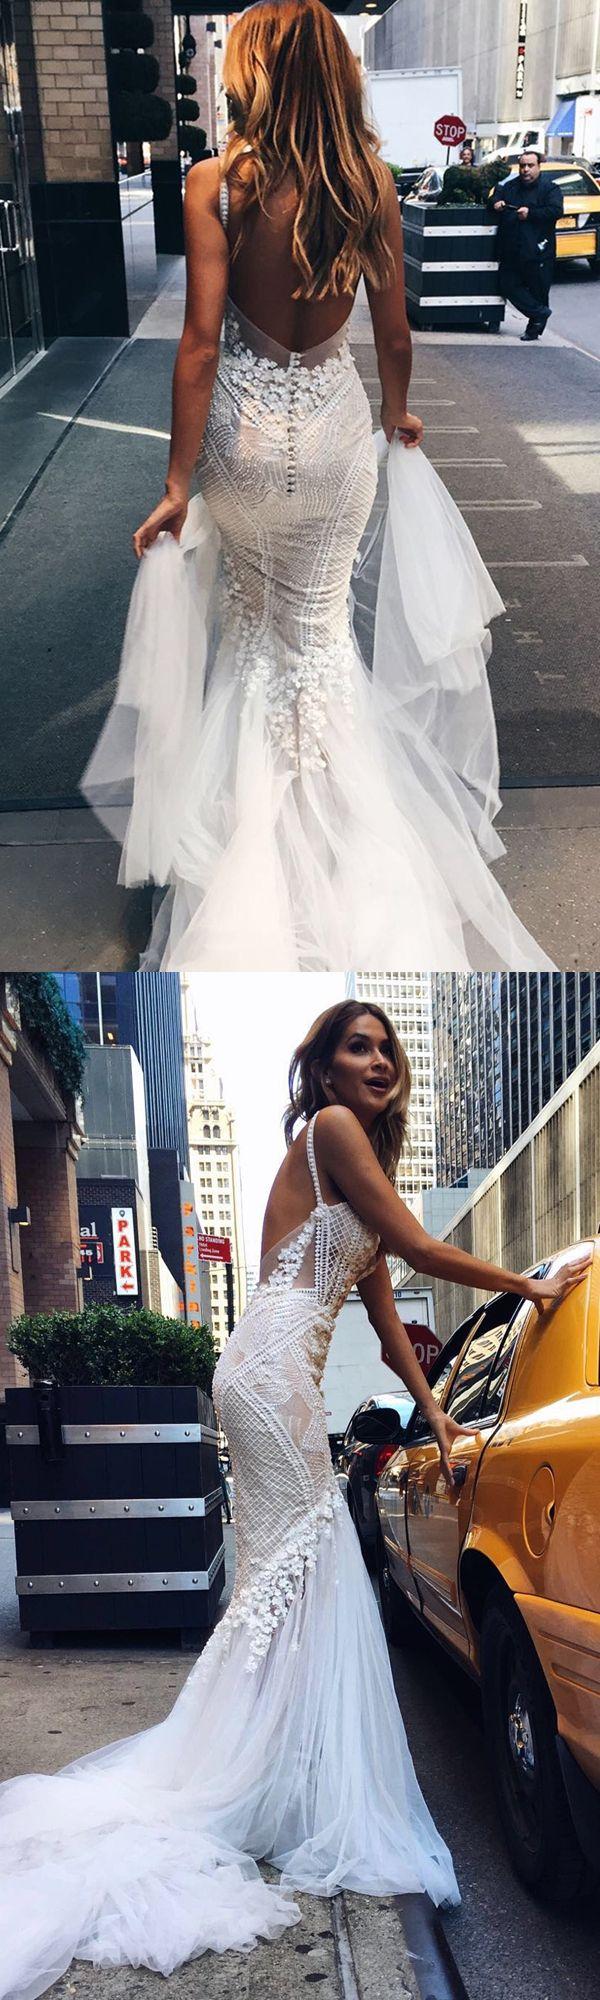 backless wedding dresses, mermaid dream wedding dresses, affordable lace wedding dresses